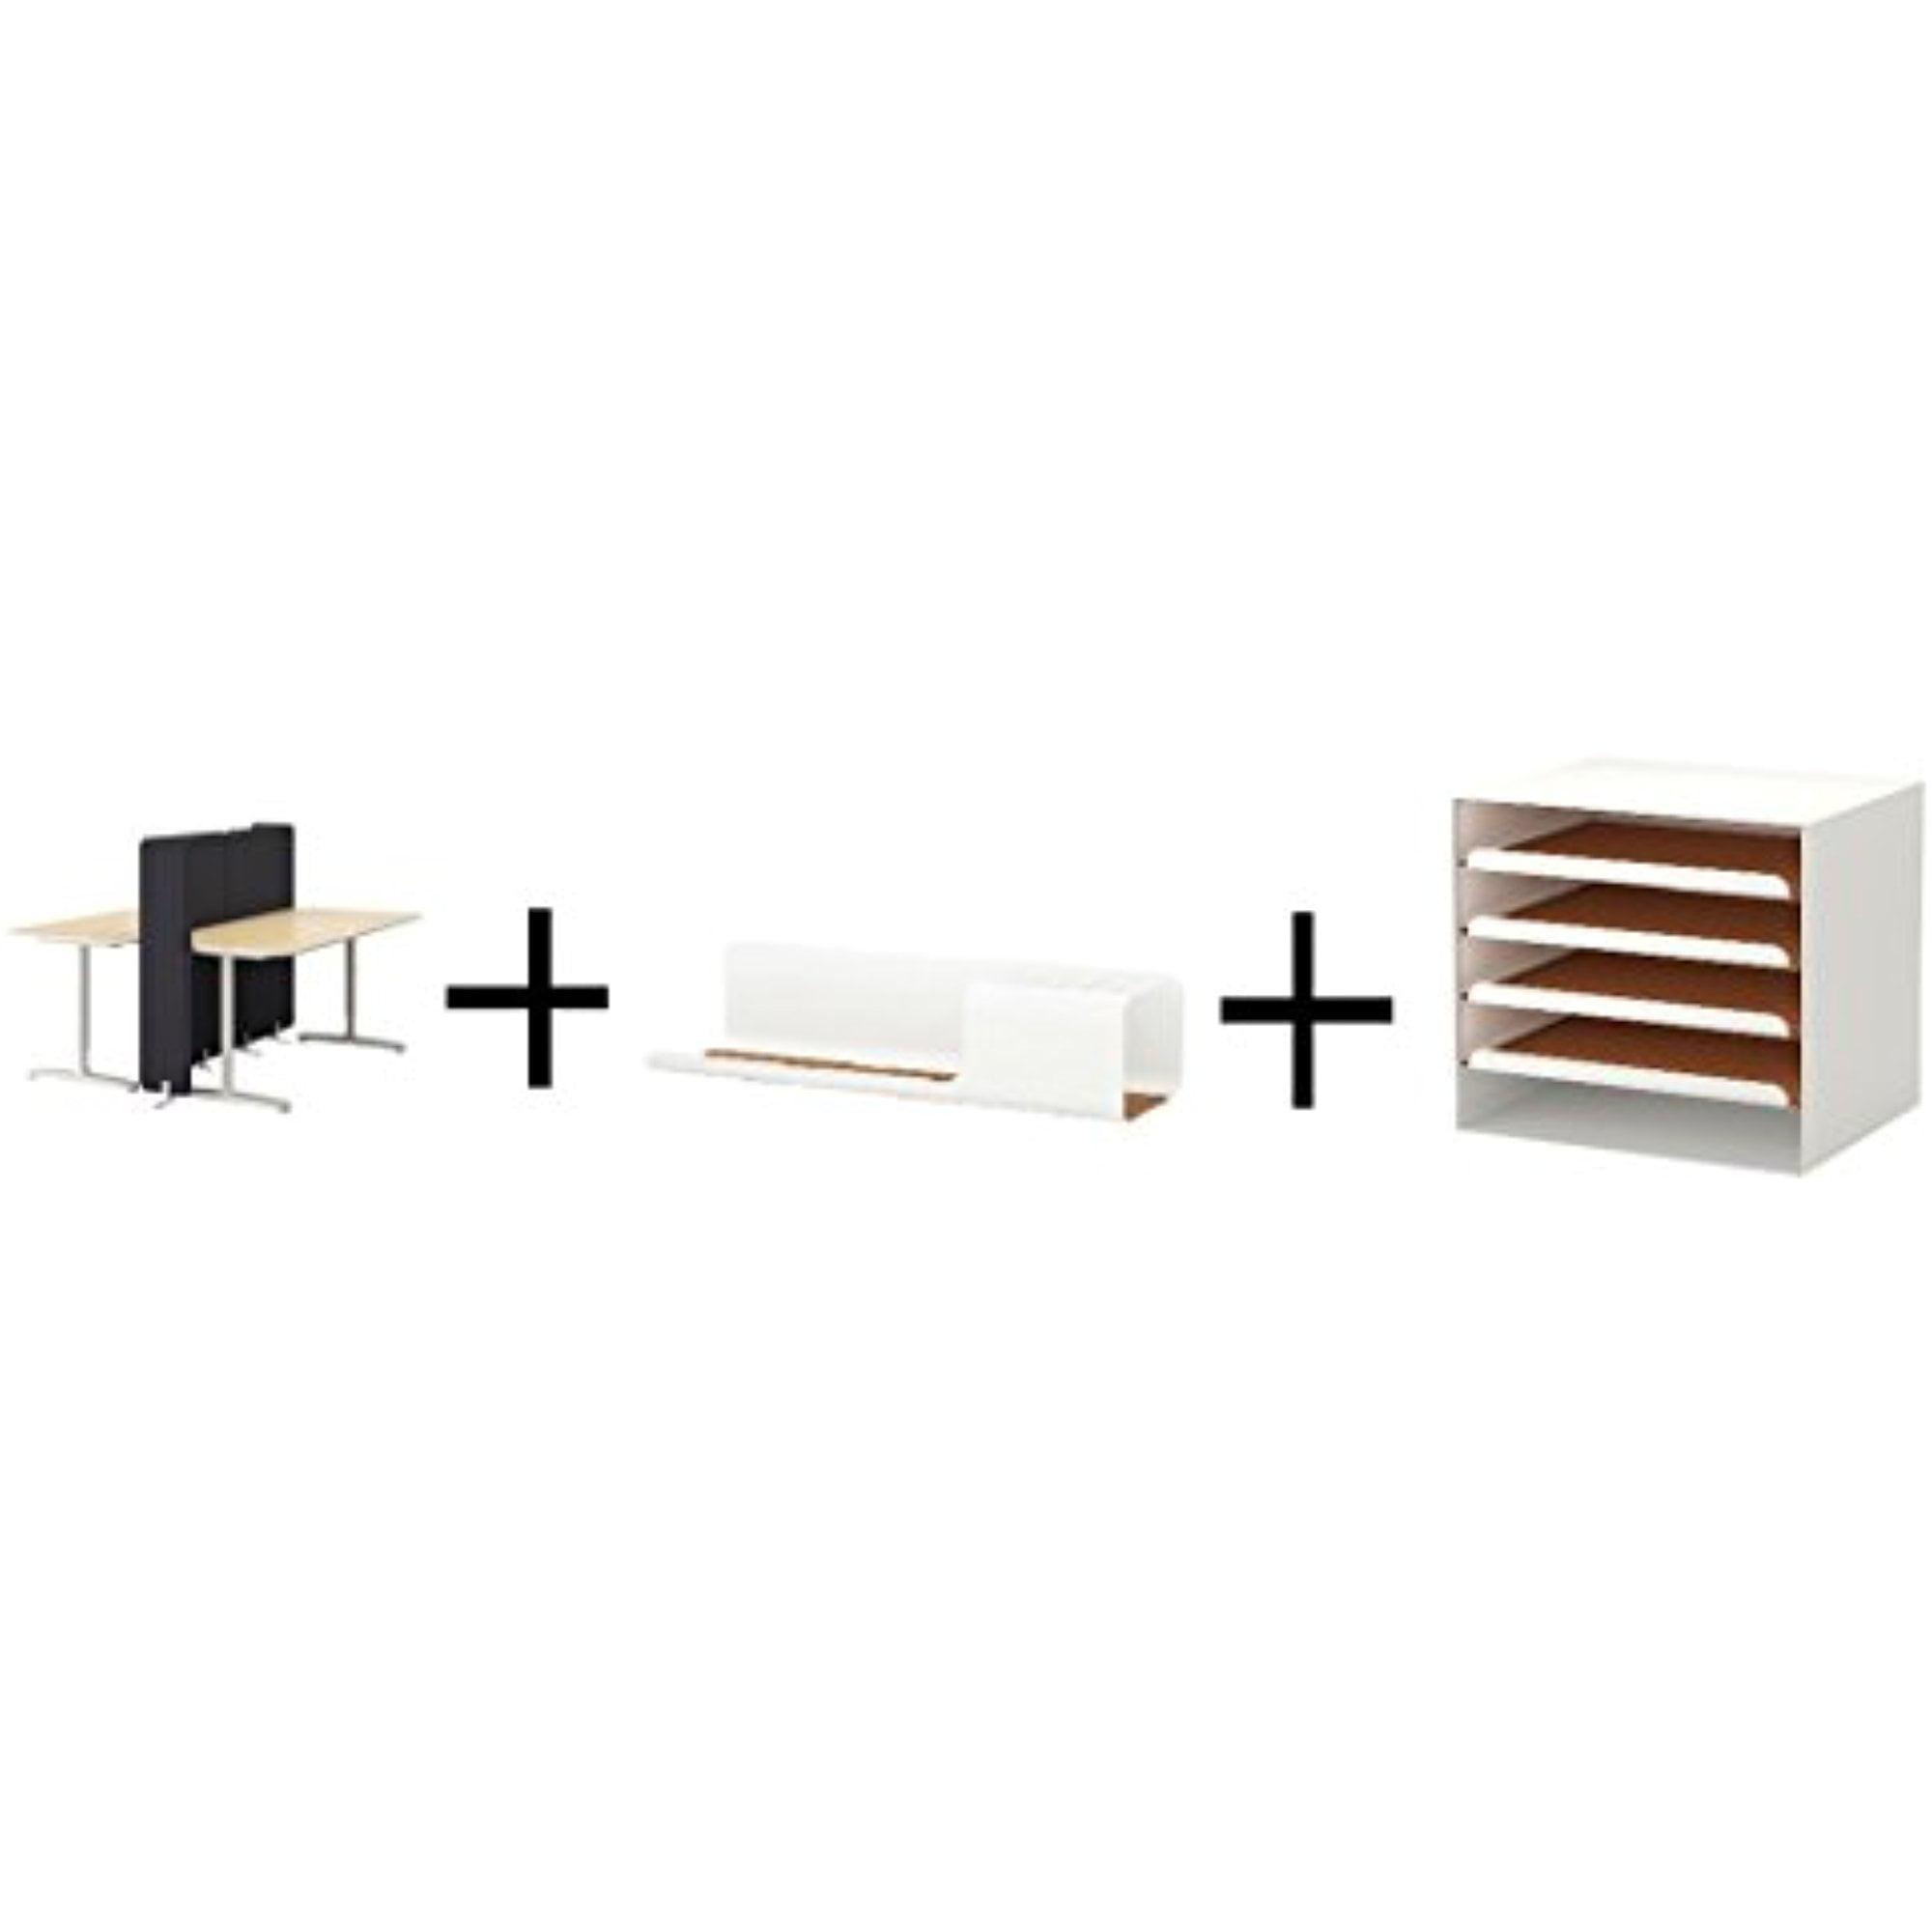 Ikea Desk with screen, birch veneer, white,Desk organizer, white